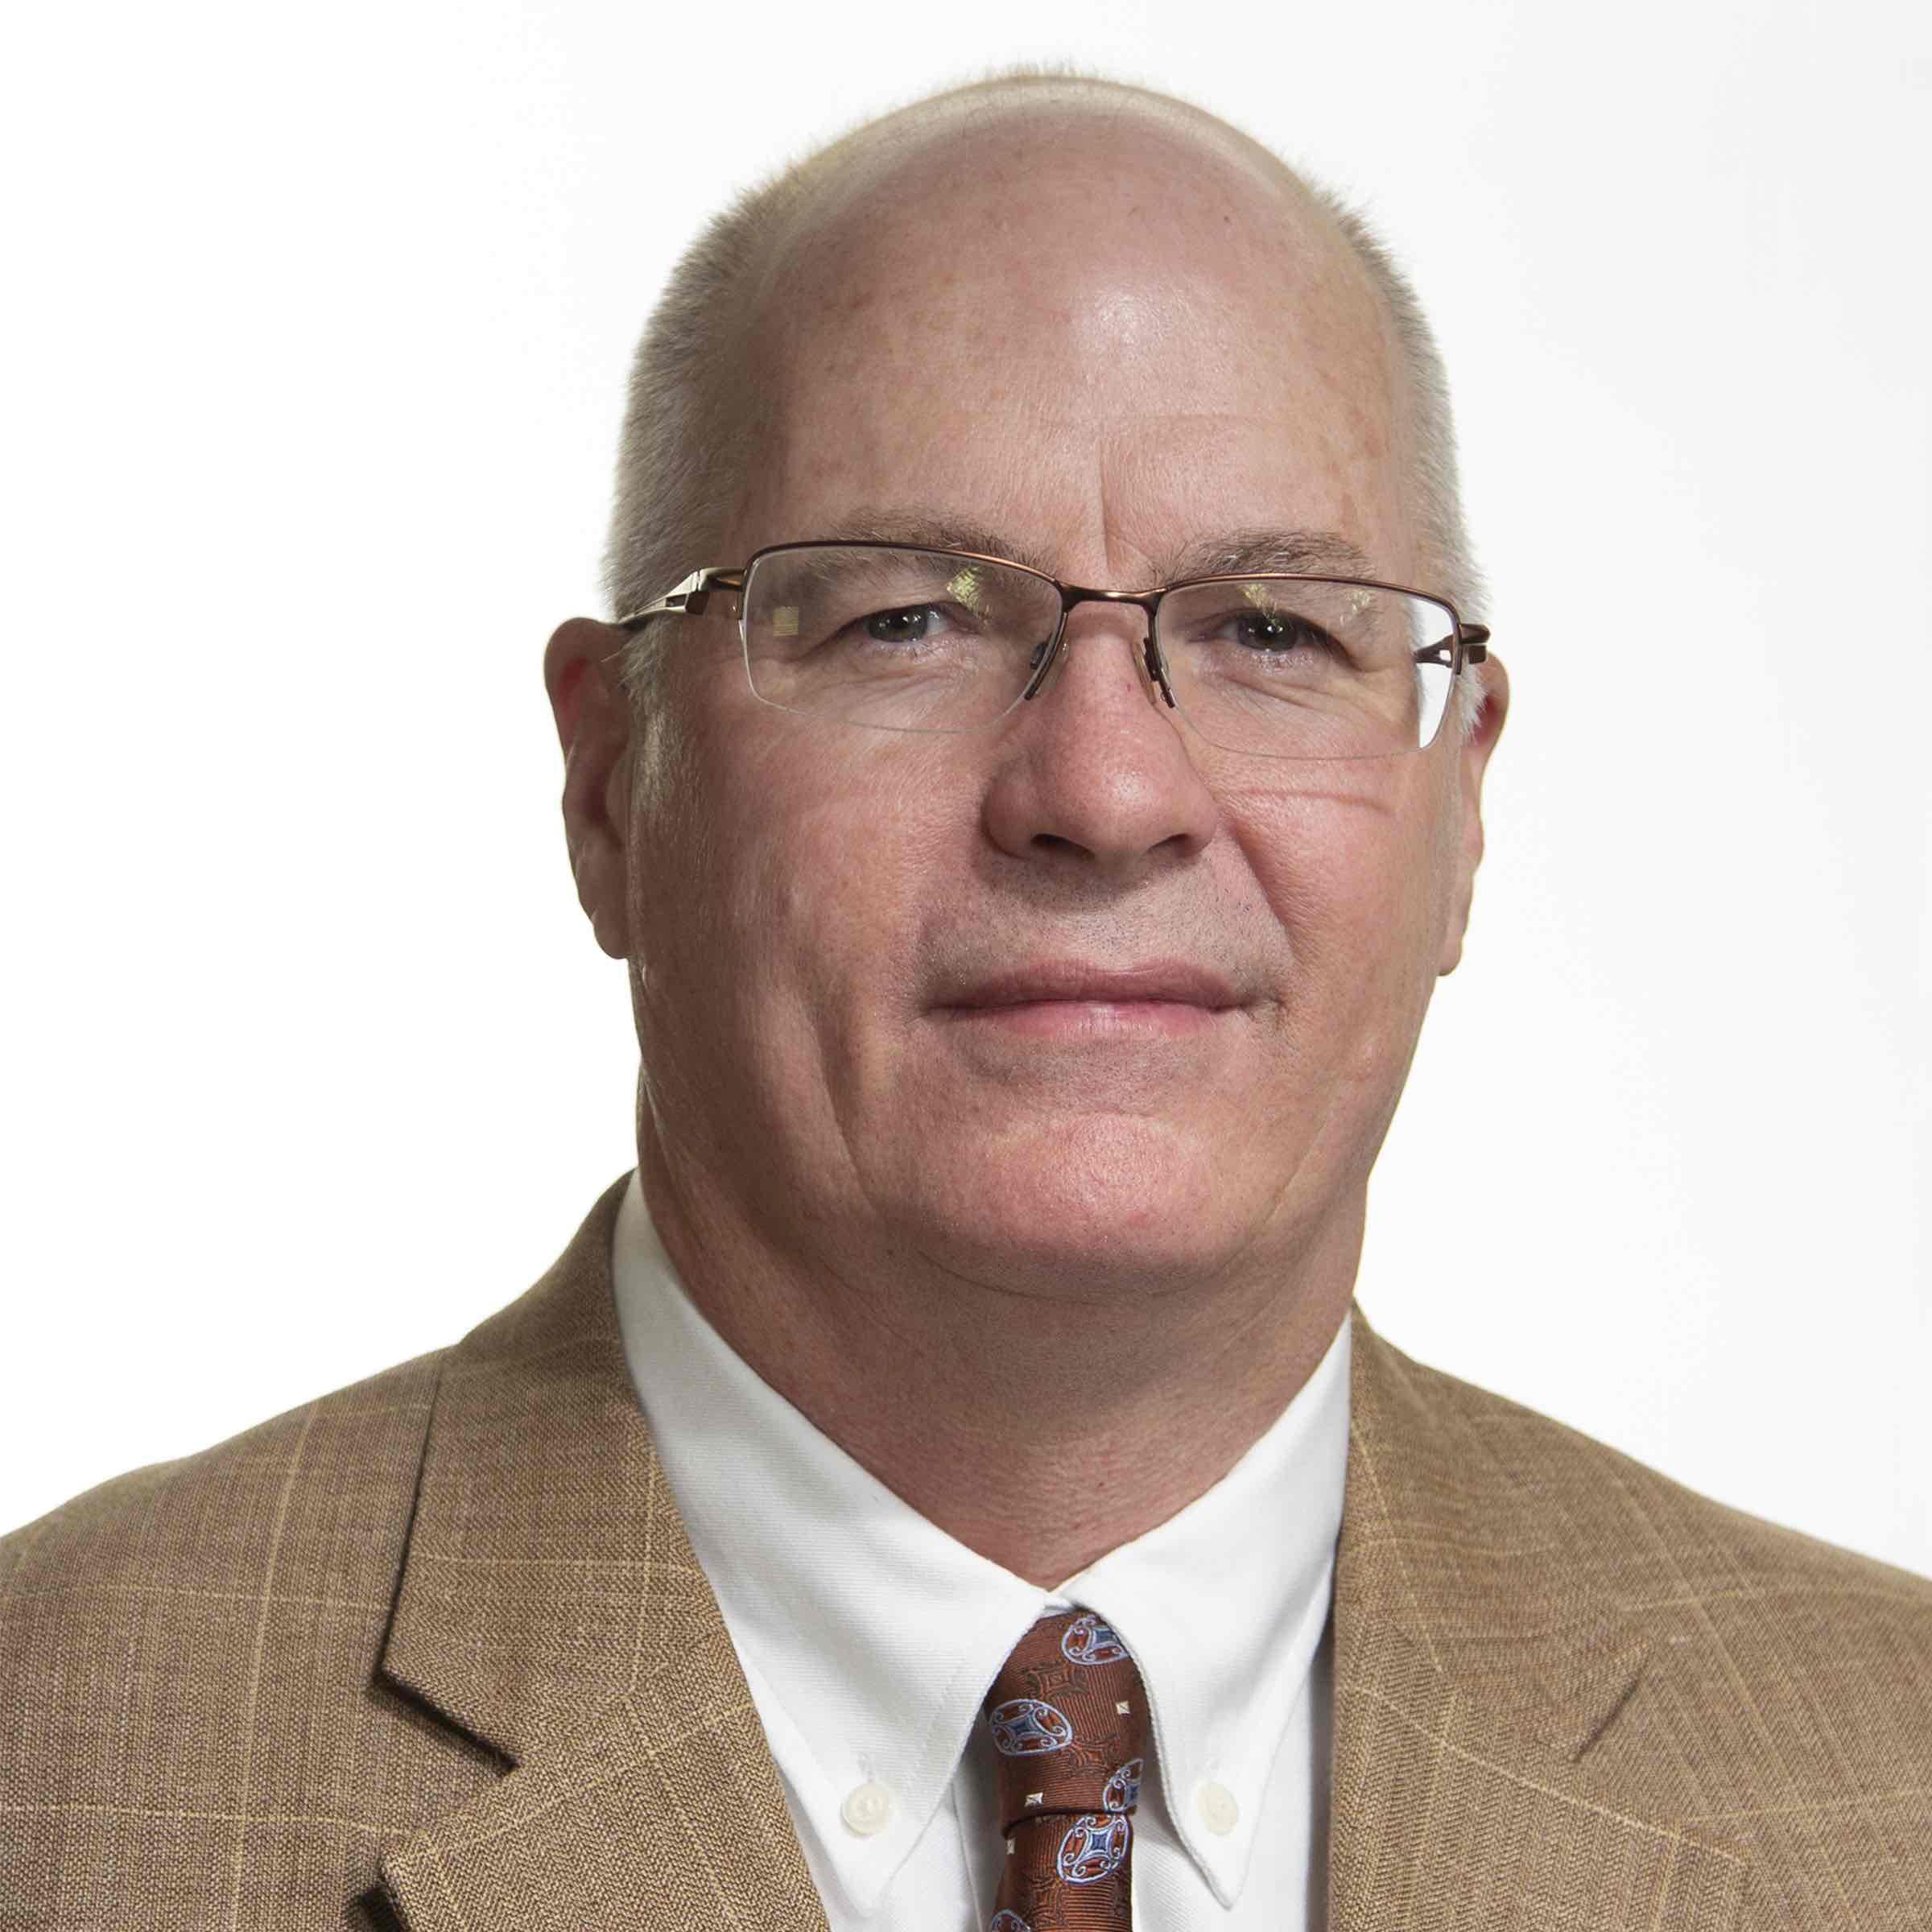 A photo of Managing Partner, Tom Lovett, Bankruptcy Lawyer